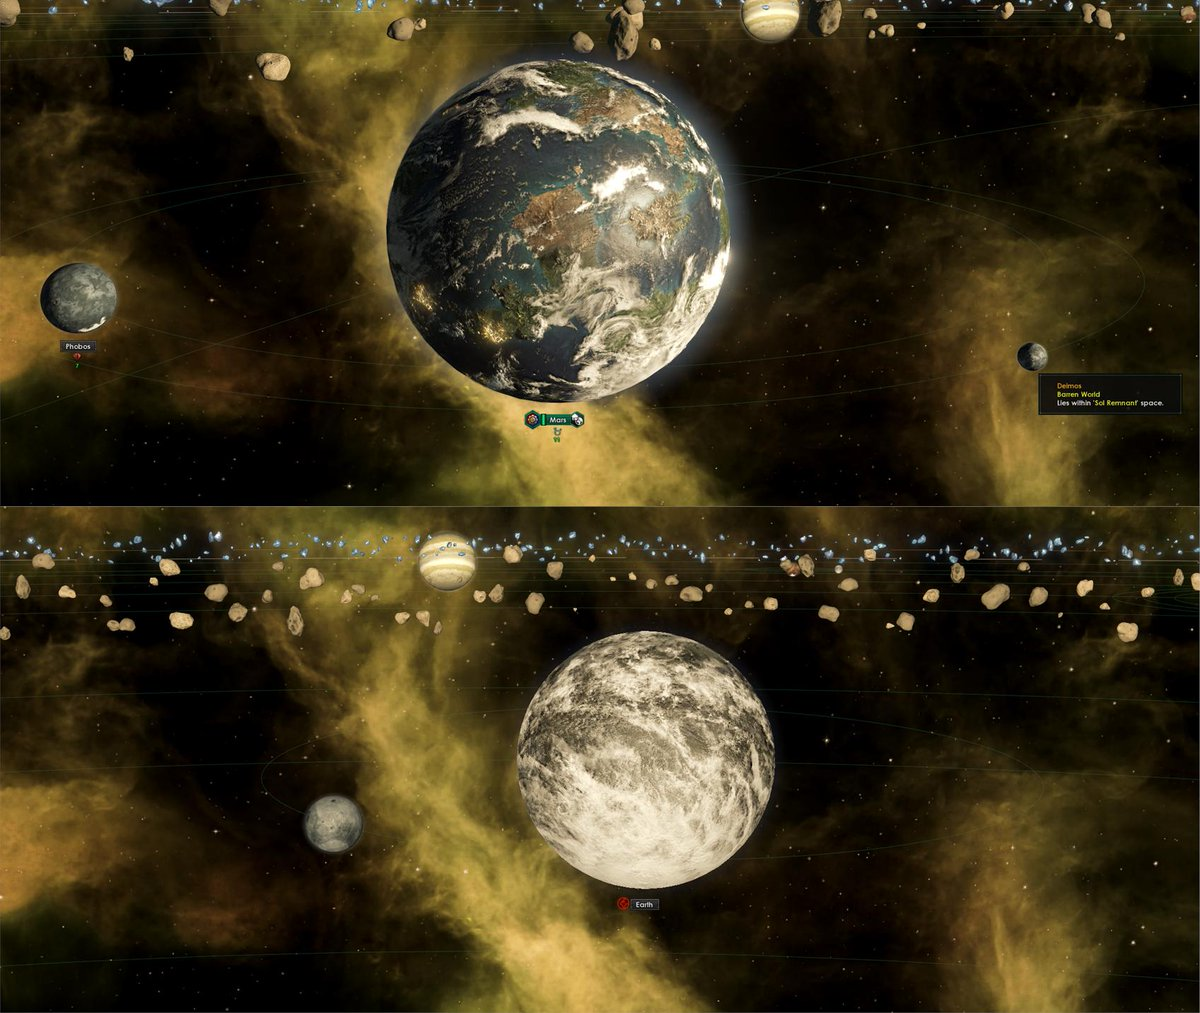 Stellaris on Twitter: